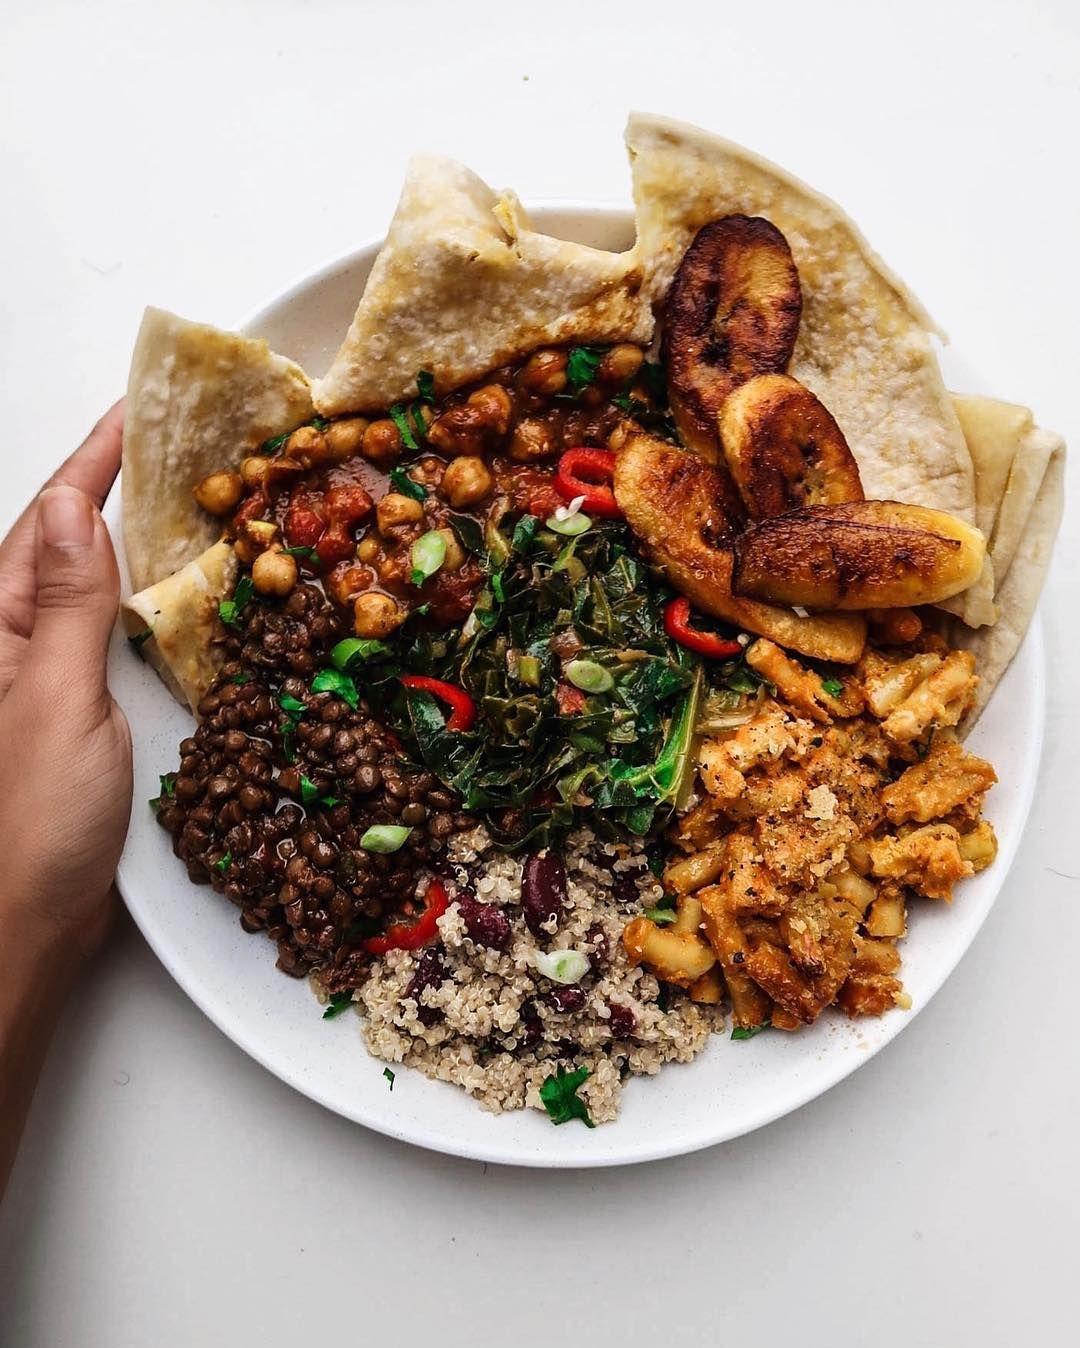 Vegan Food Is Blandboring Said Rachel Never I Shared Each